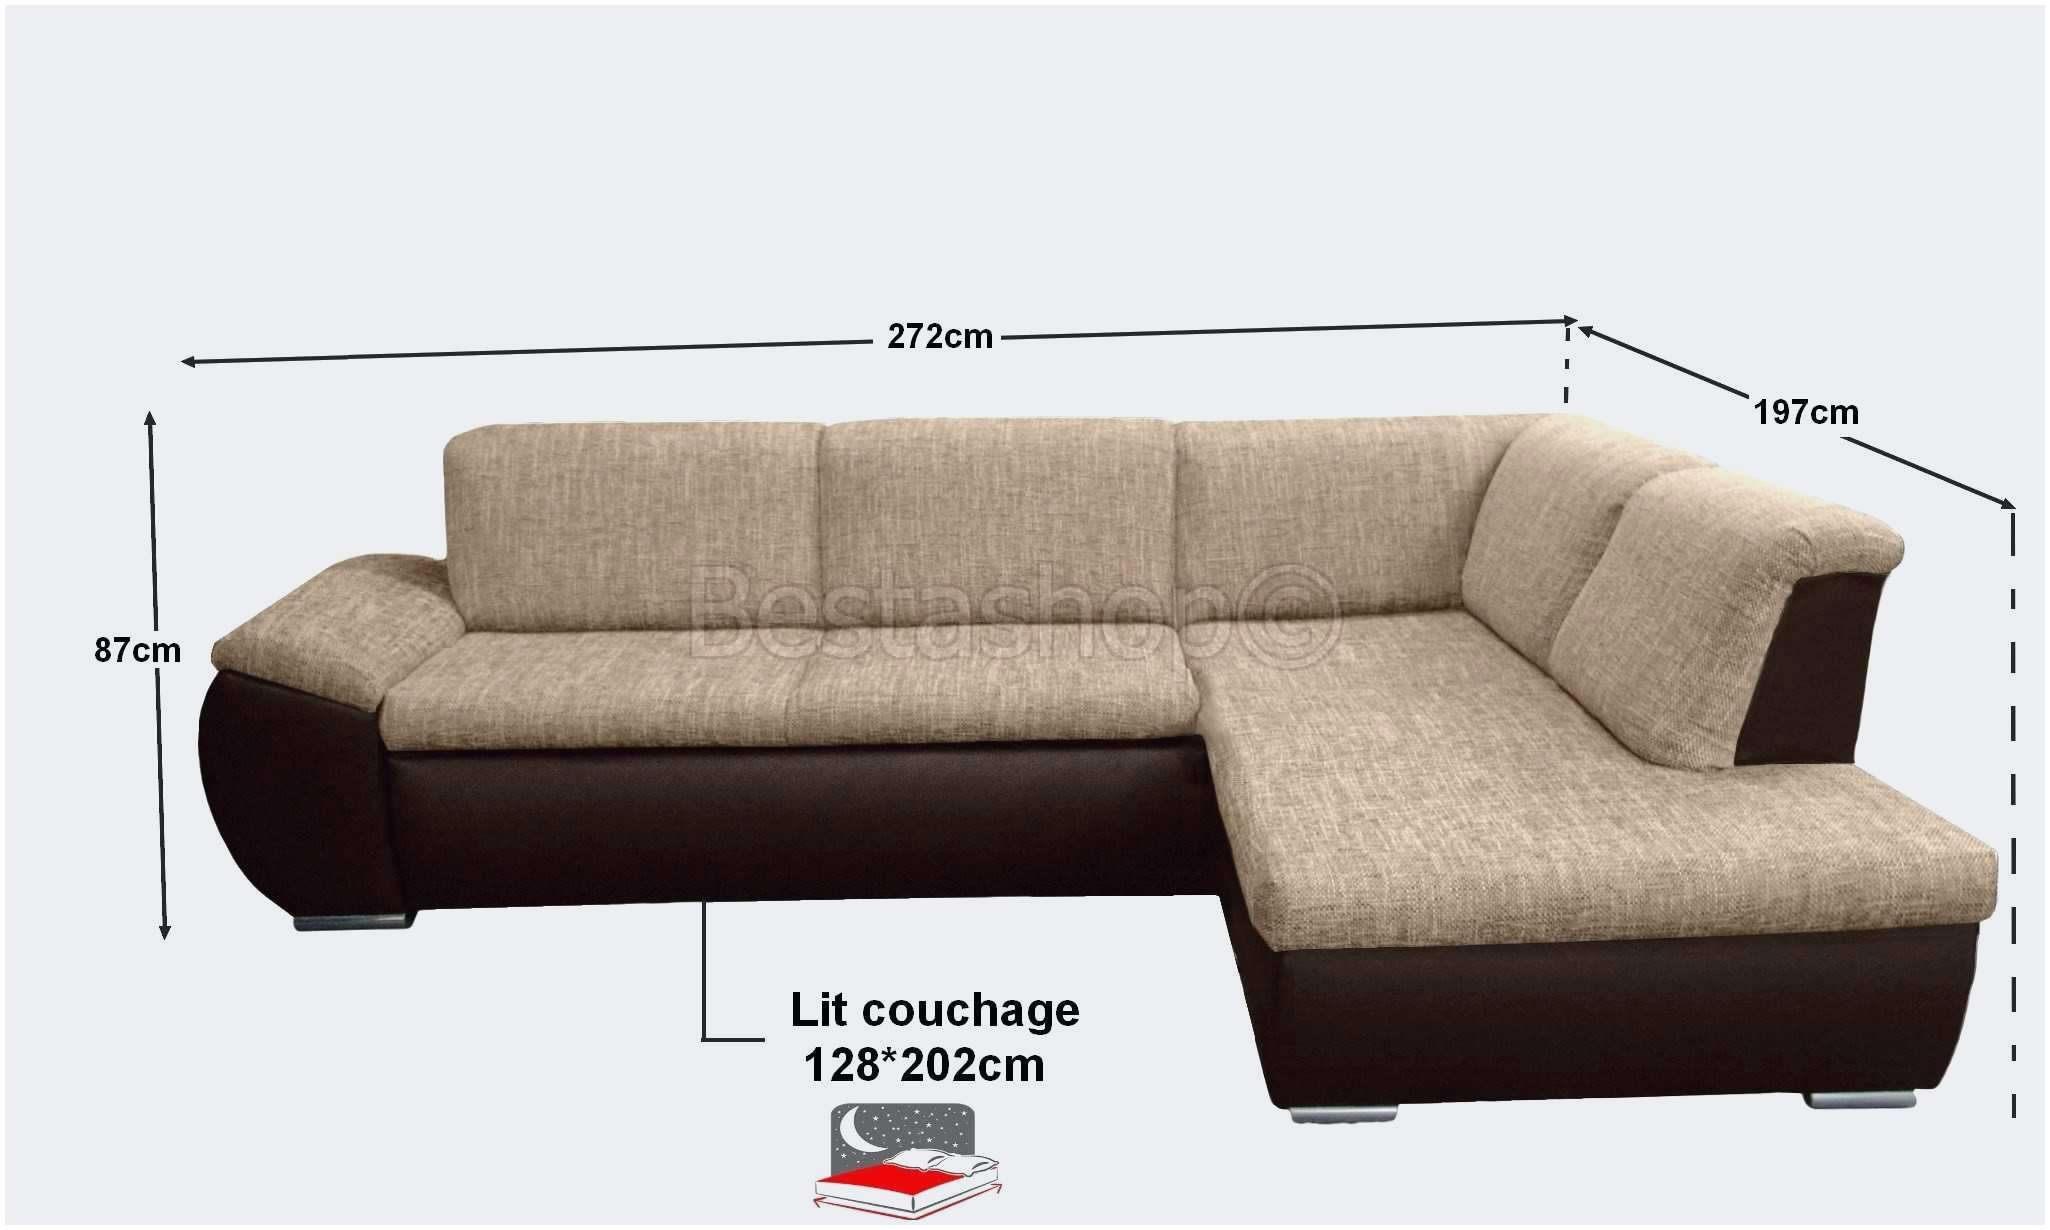 Canapé Lit Angle Inspiré Elégant Canapé Angle Habitat Luxe S Canap Simili Cuir Marron 27 C3